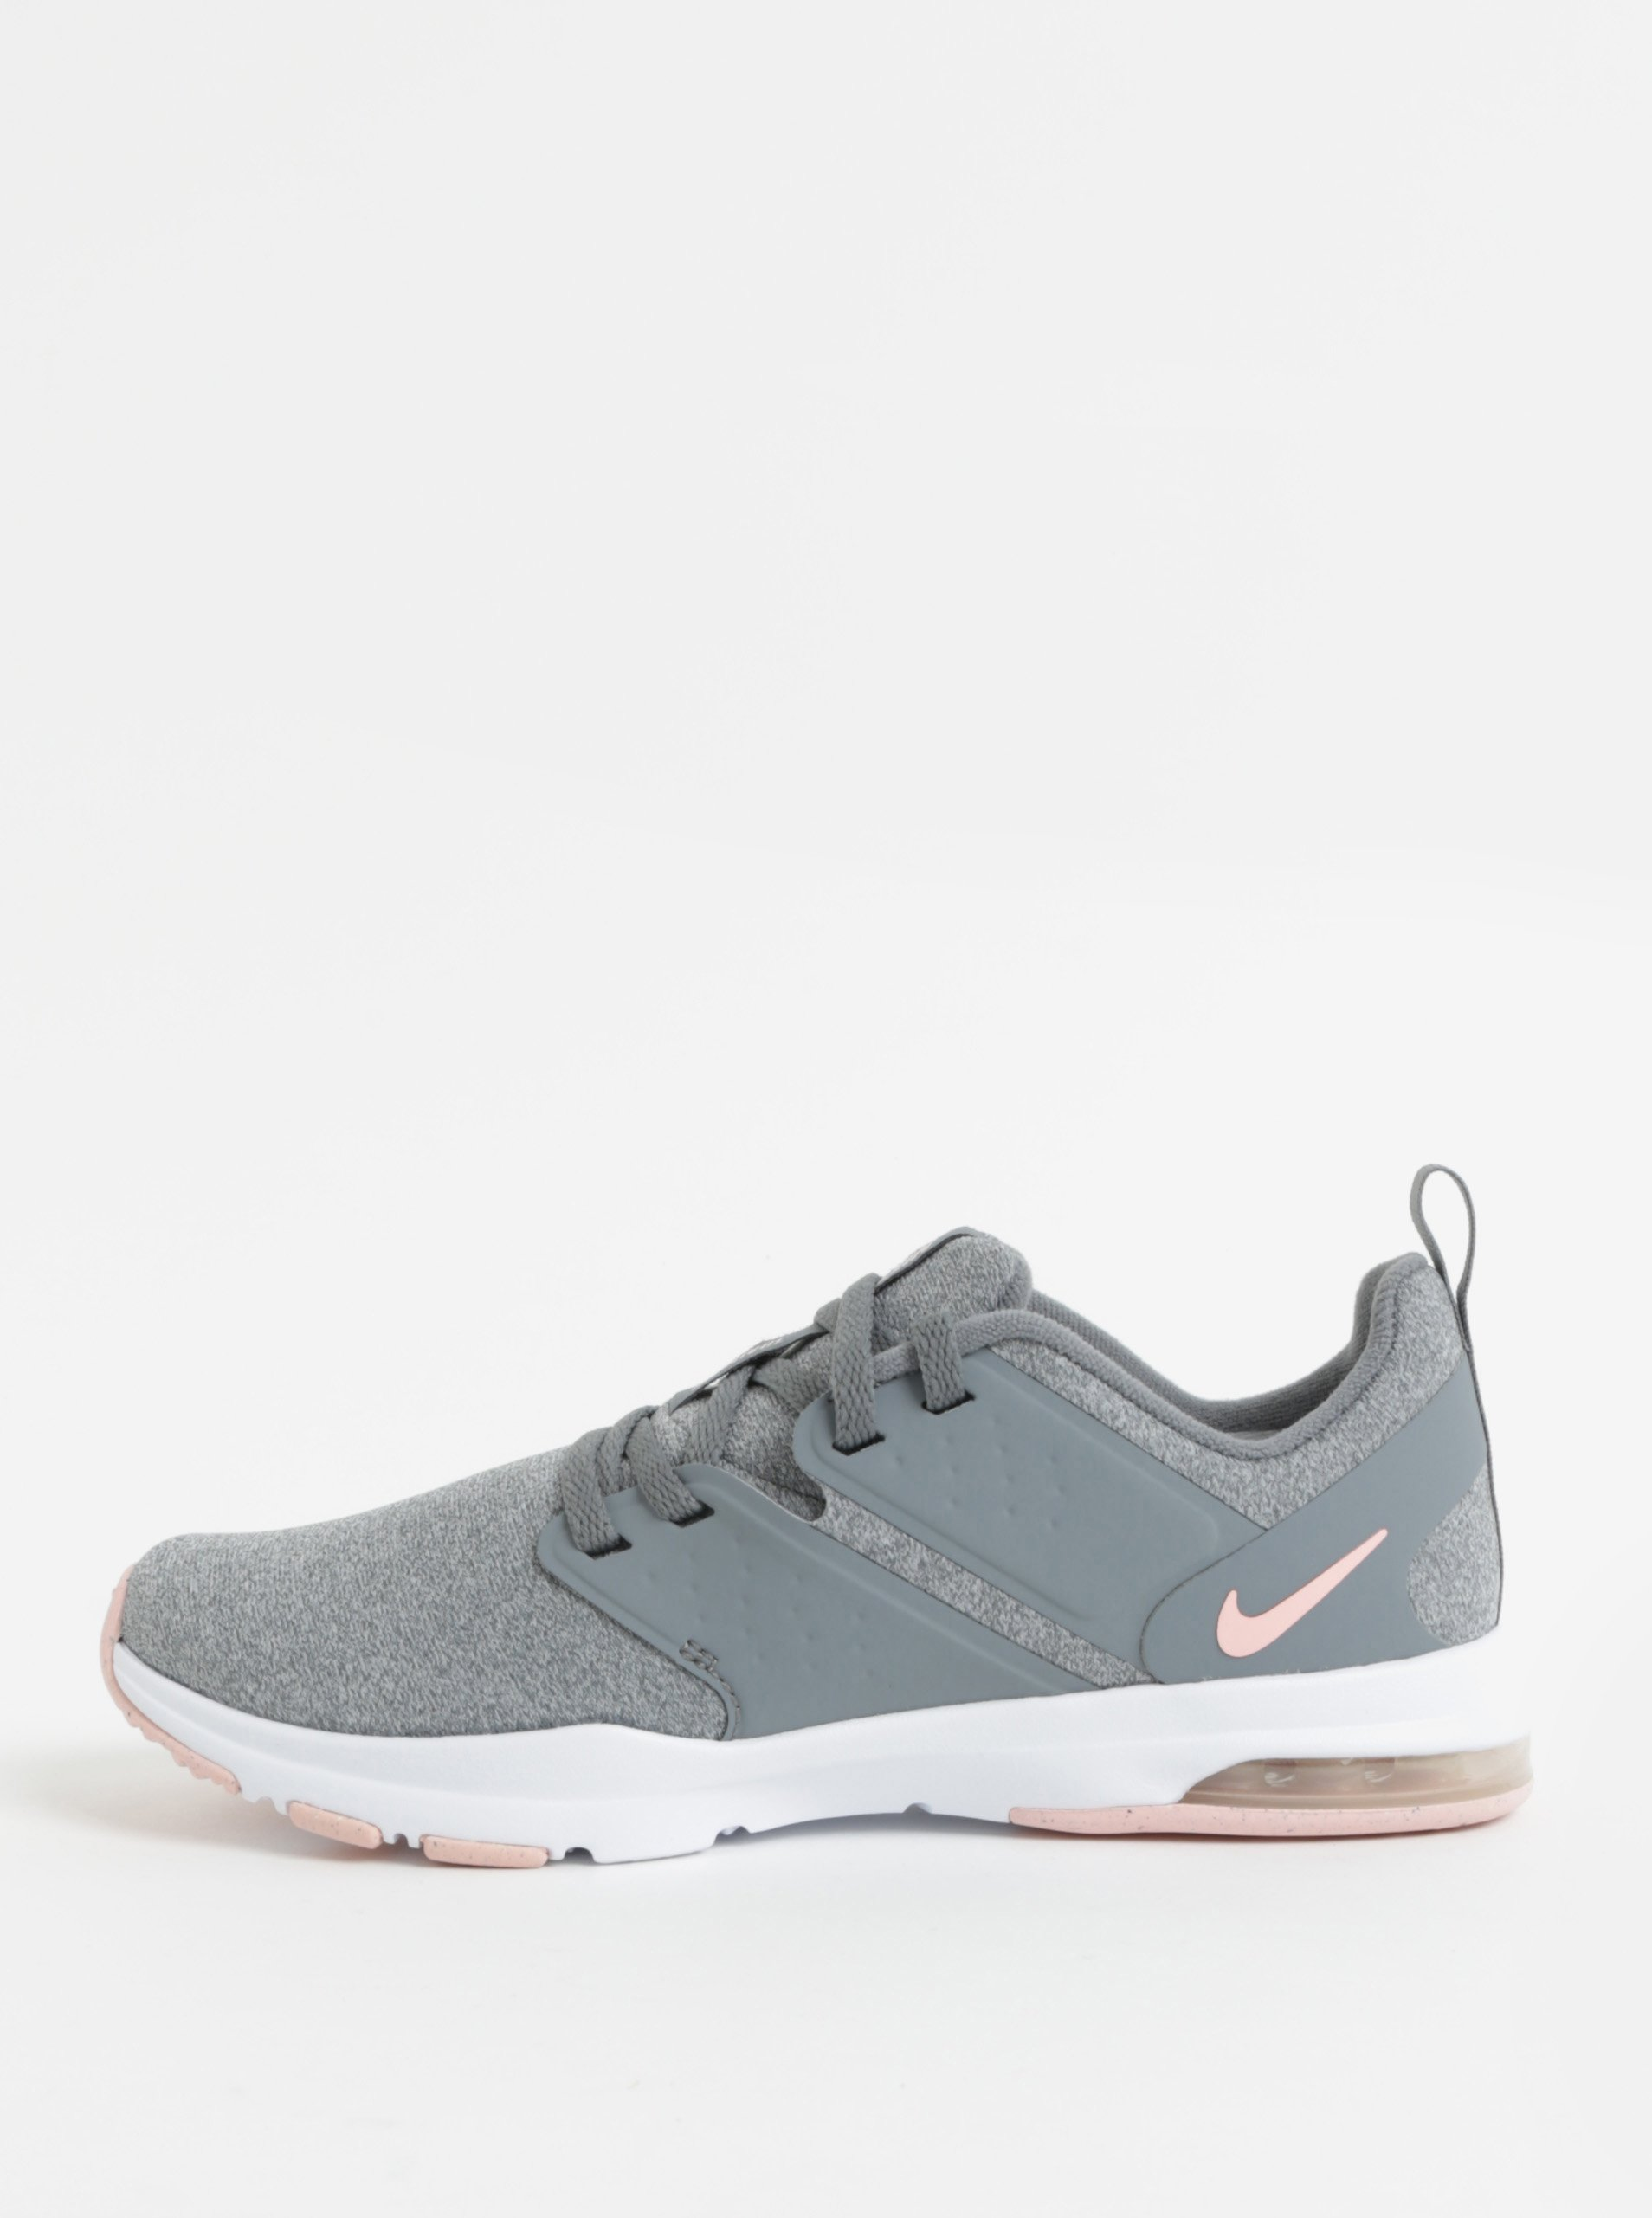 Sivé dámske melírované tenisky Nike Air Bella Training 23a46abe60d